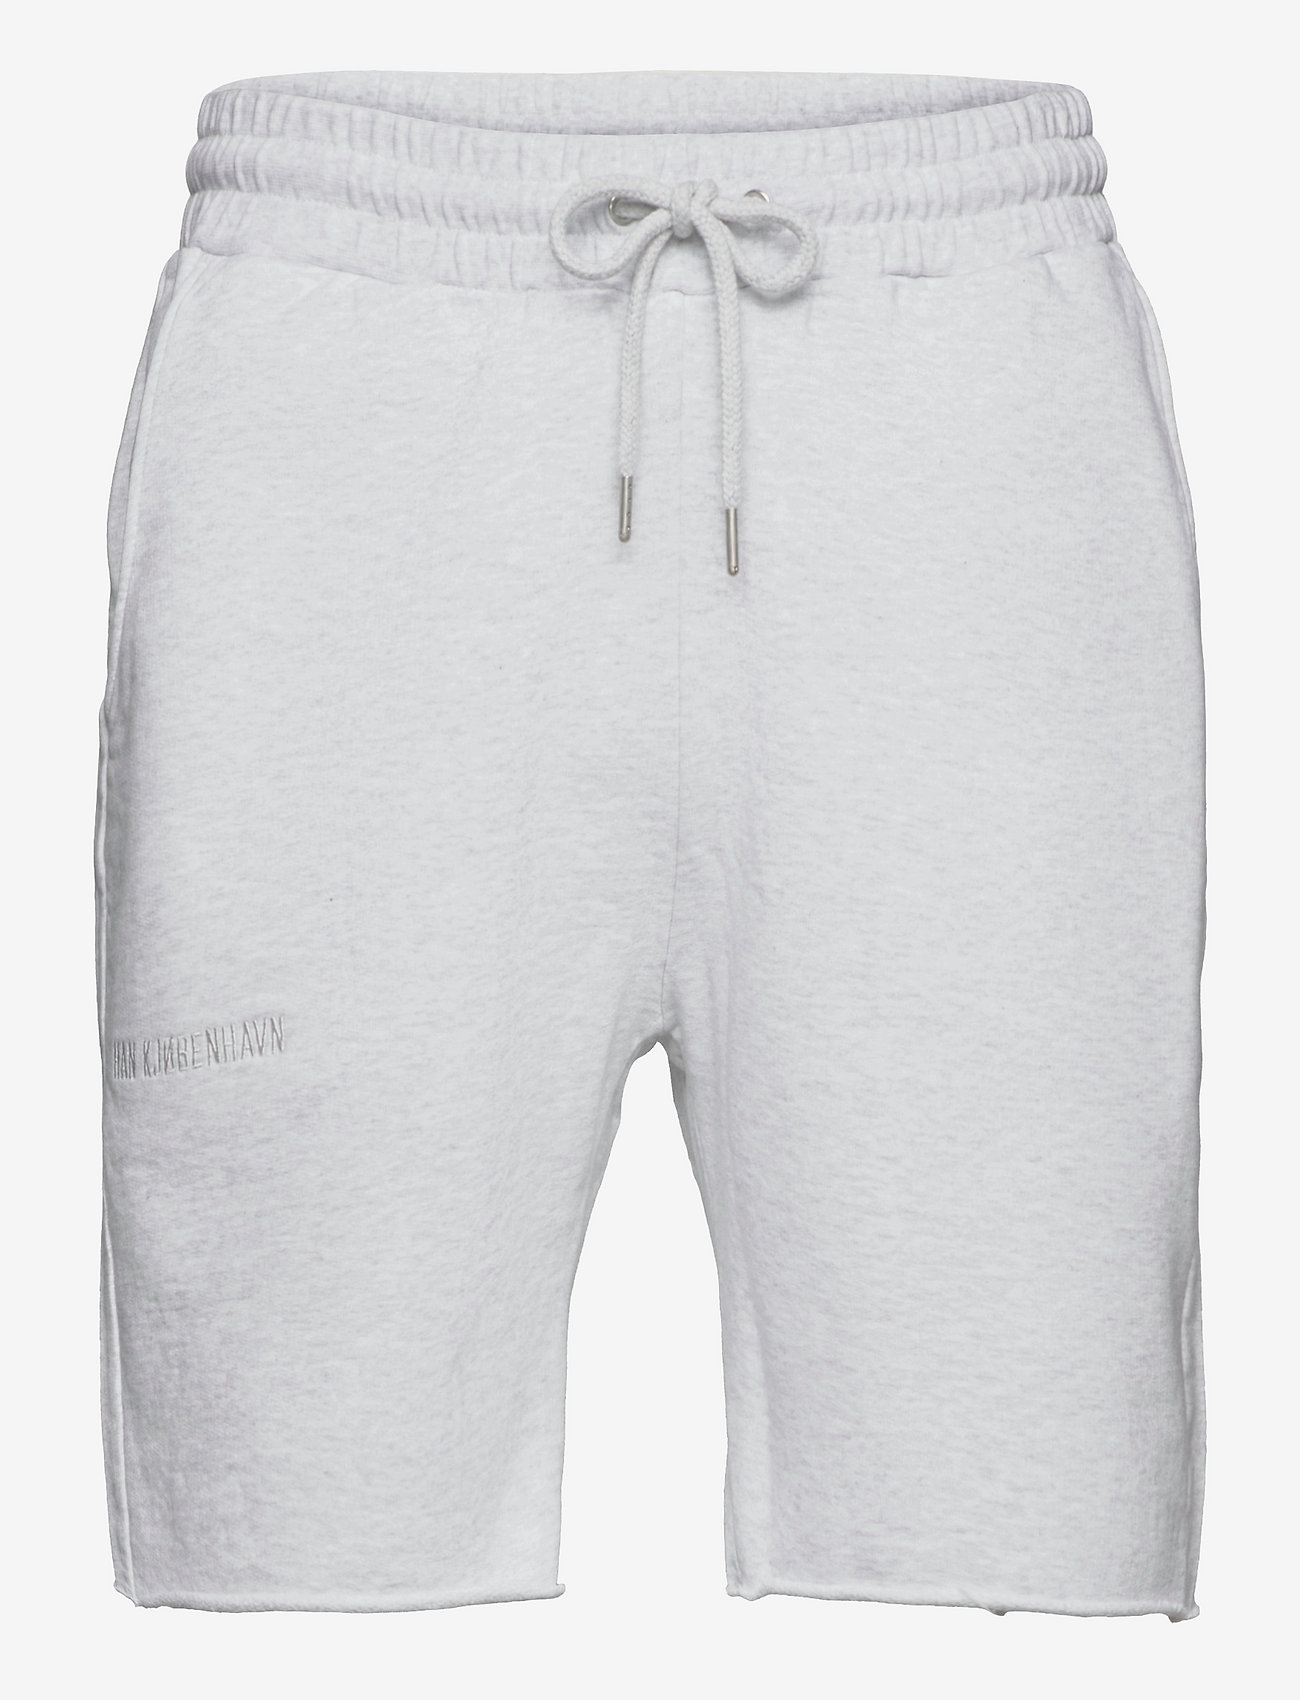 HAN Kjøbenhavn - Sweat shorts - casual shorts - light grey melange logo - 0